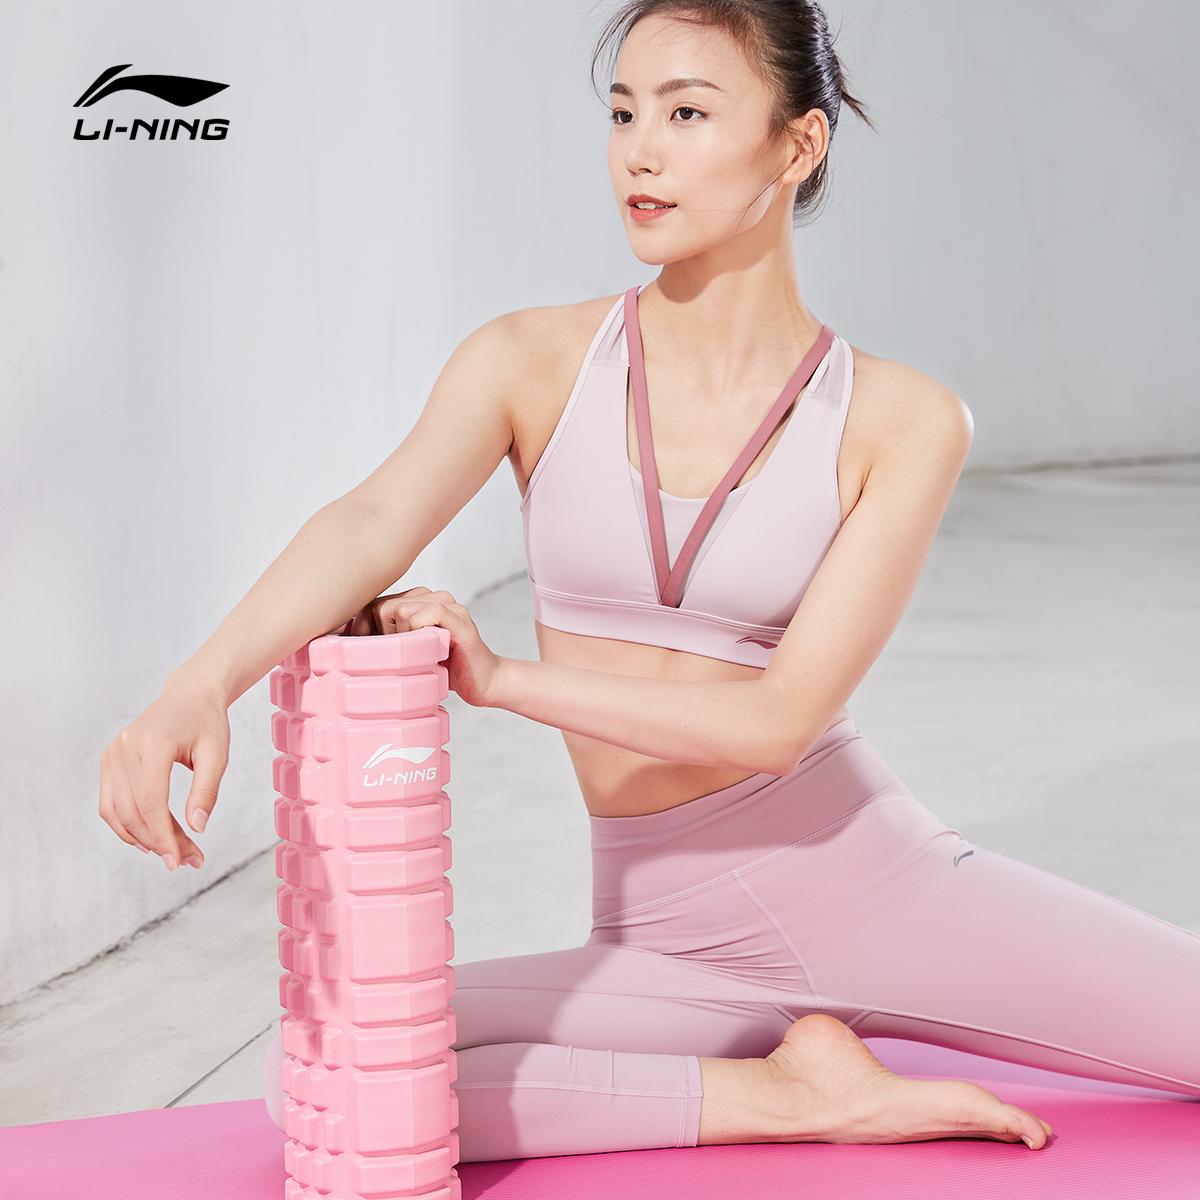 Li Ning Yoga Column 2020 New Sports Life Series Yoga Exercise Care AQTQ166